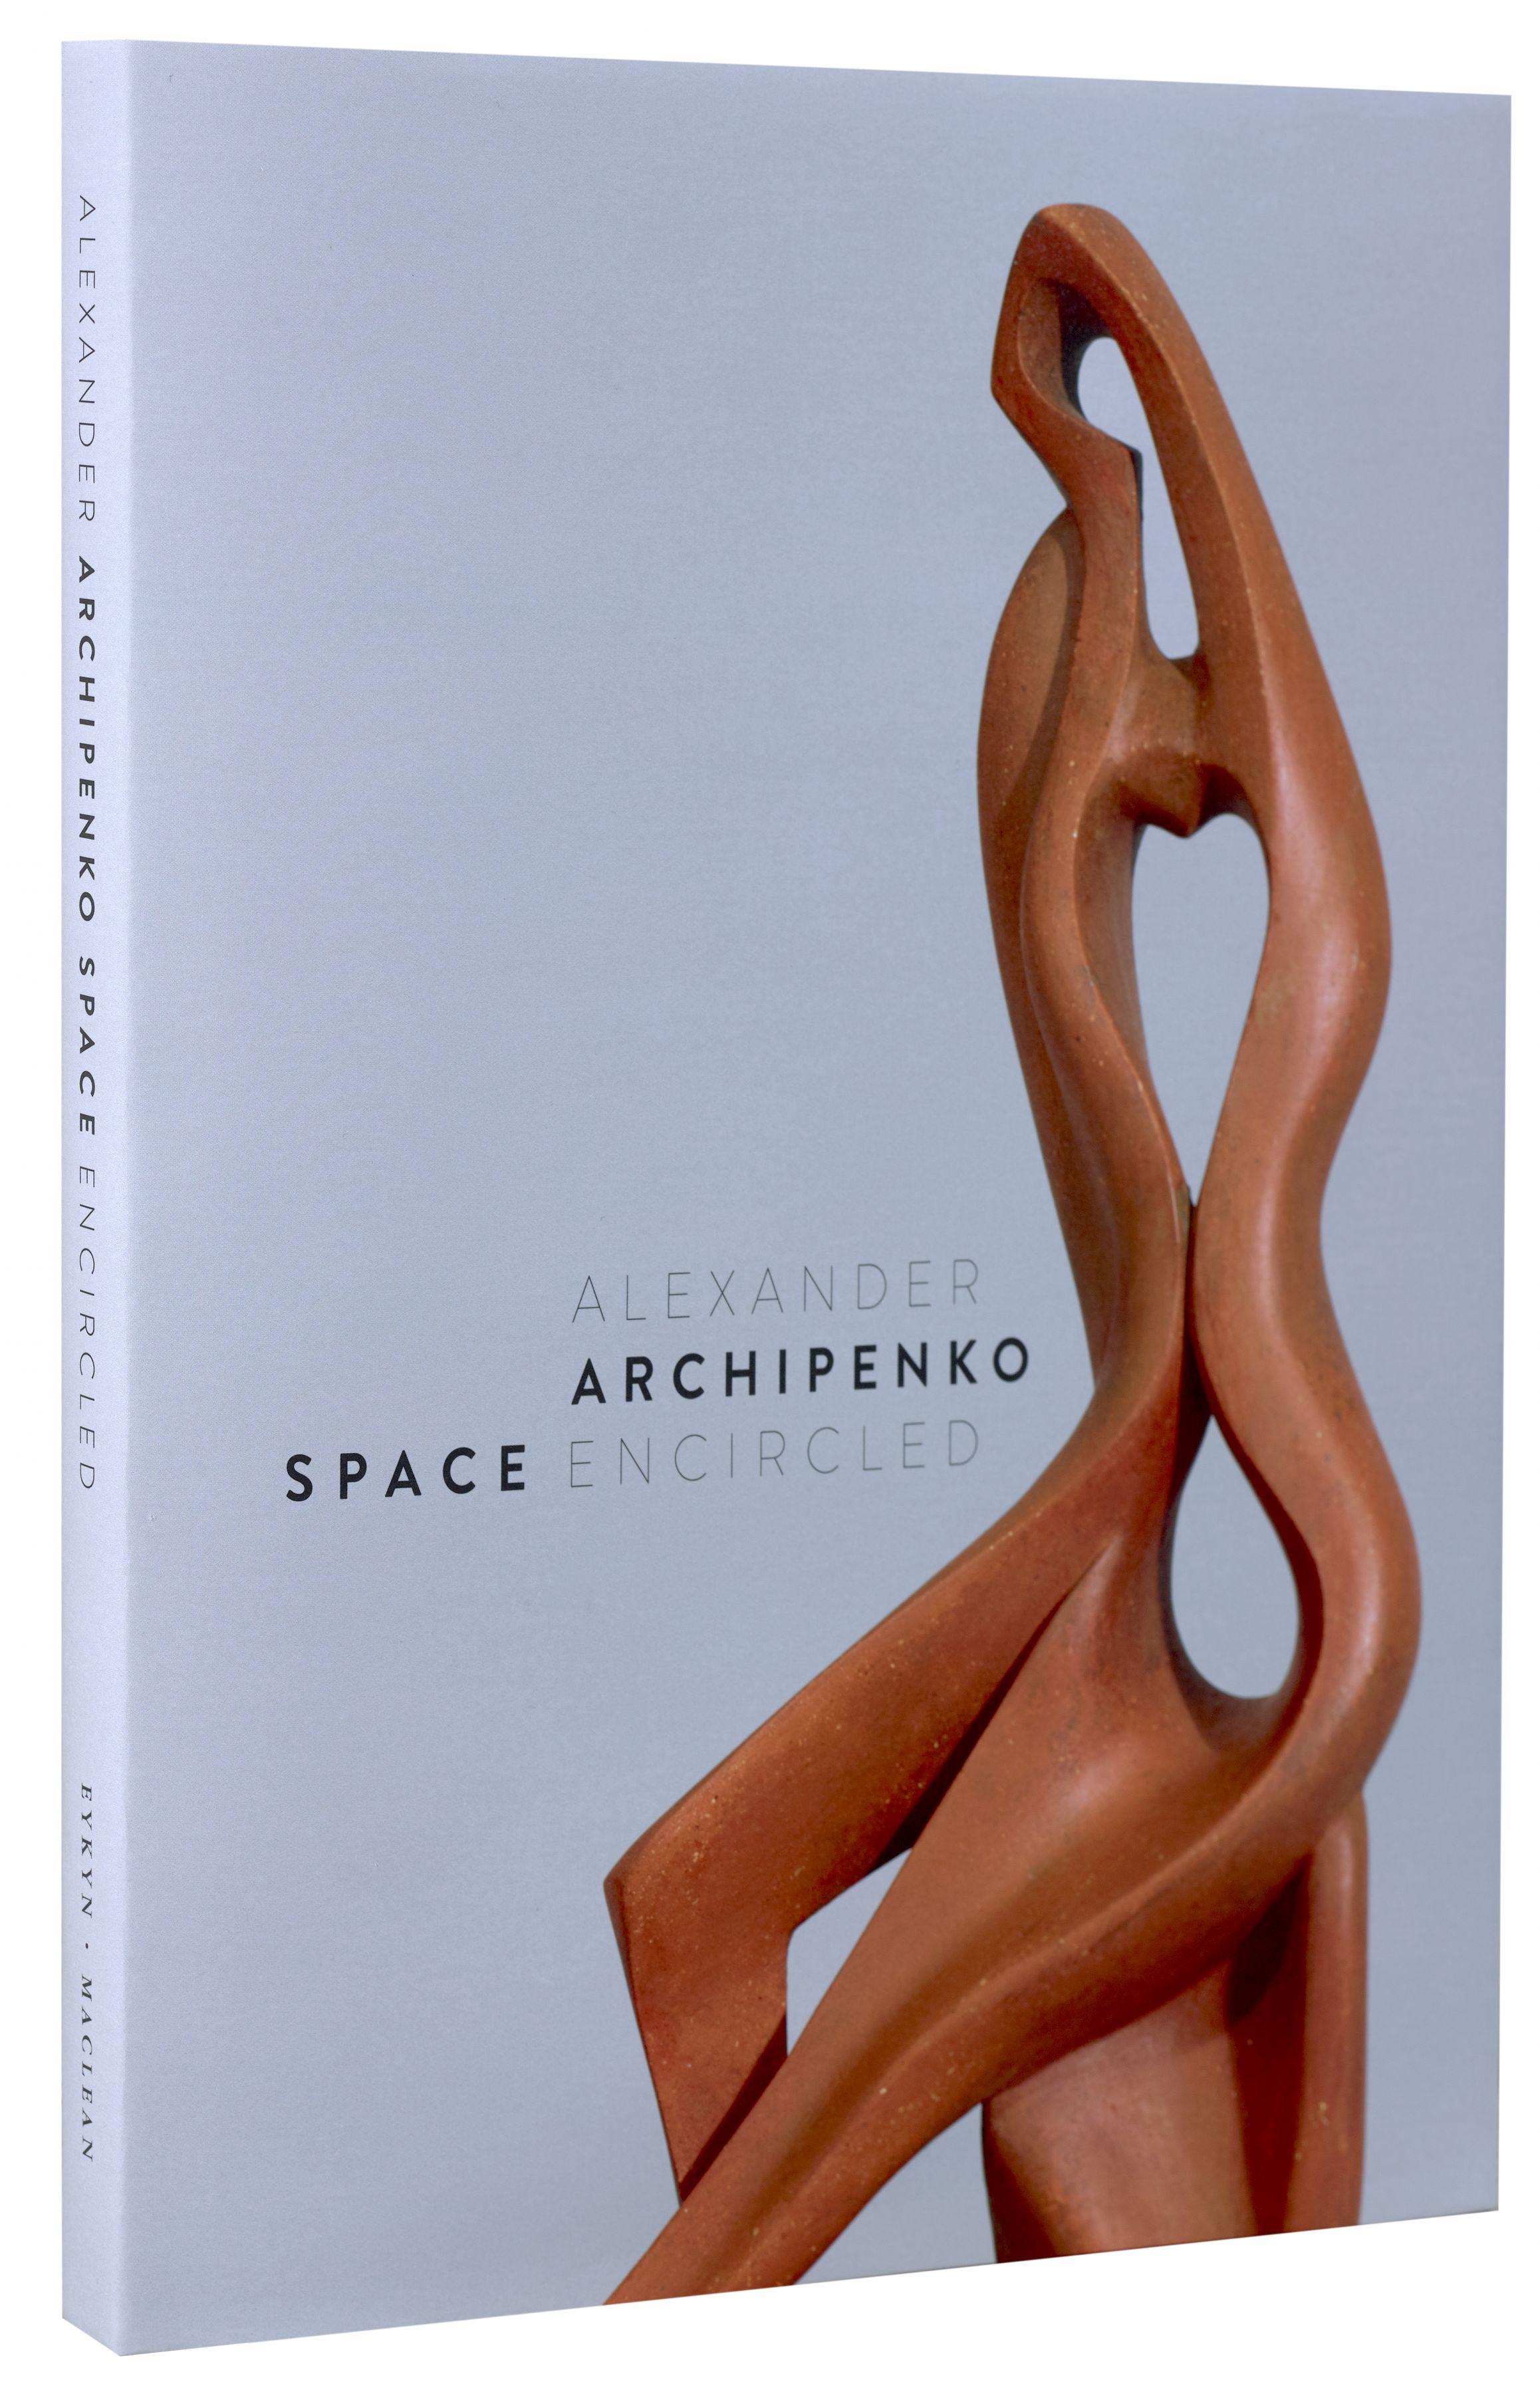 Alexander Archipenko: Space Encircled